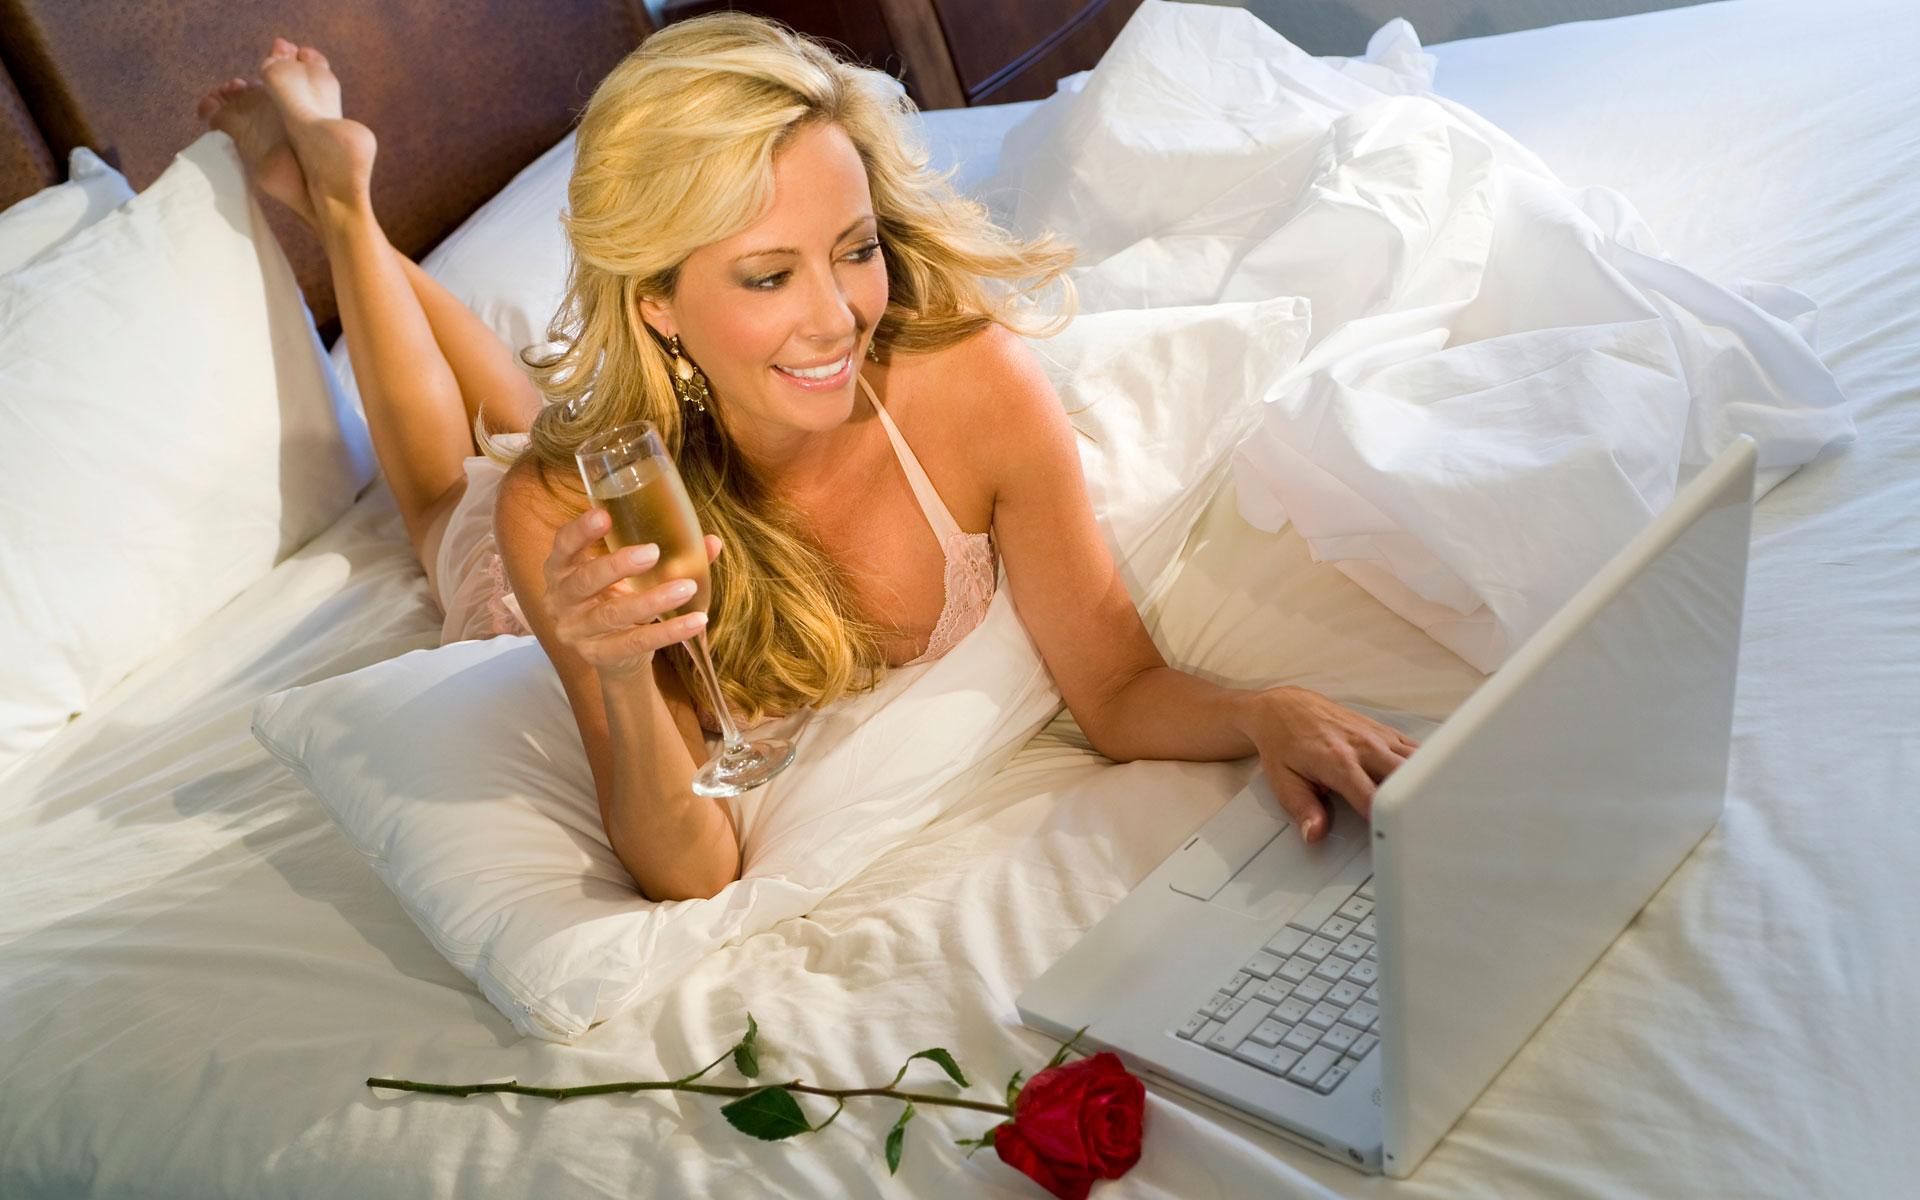 Sexchat en Webcamsex met geile mensen!